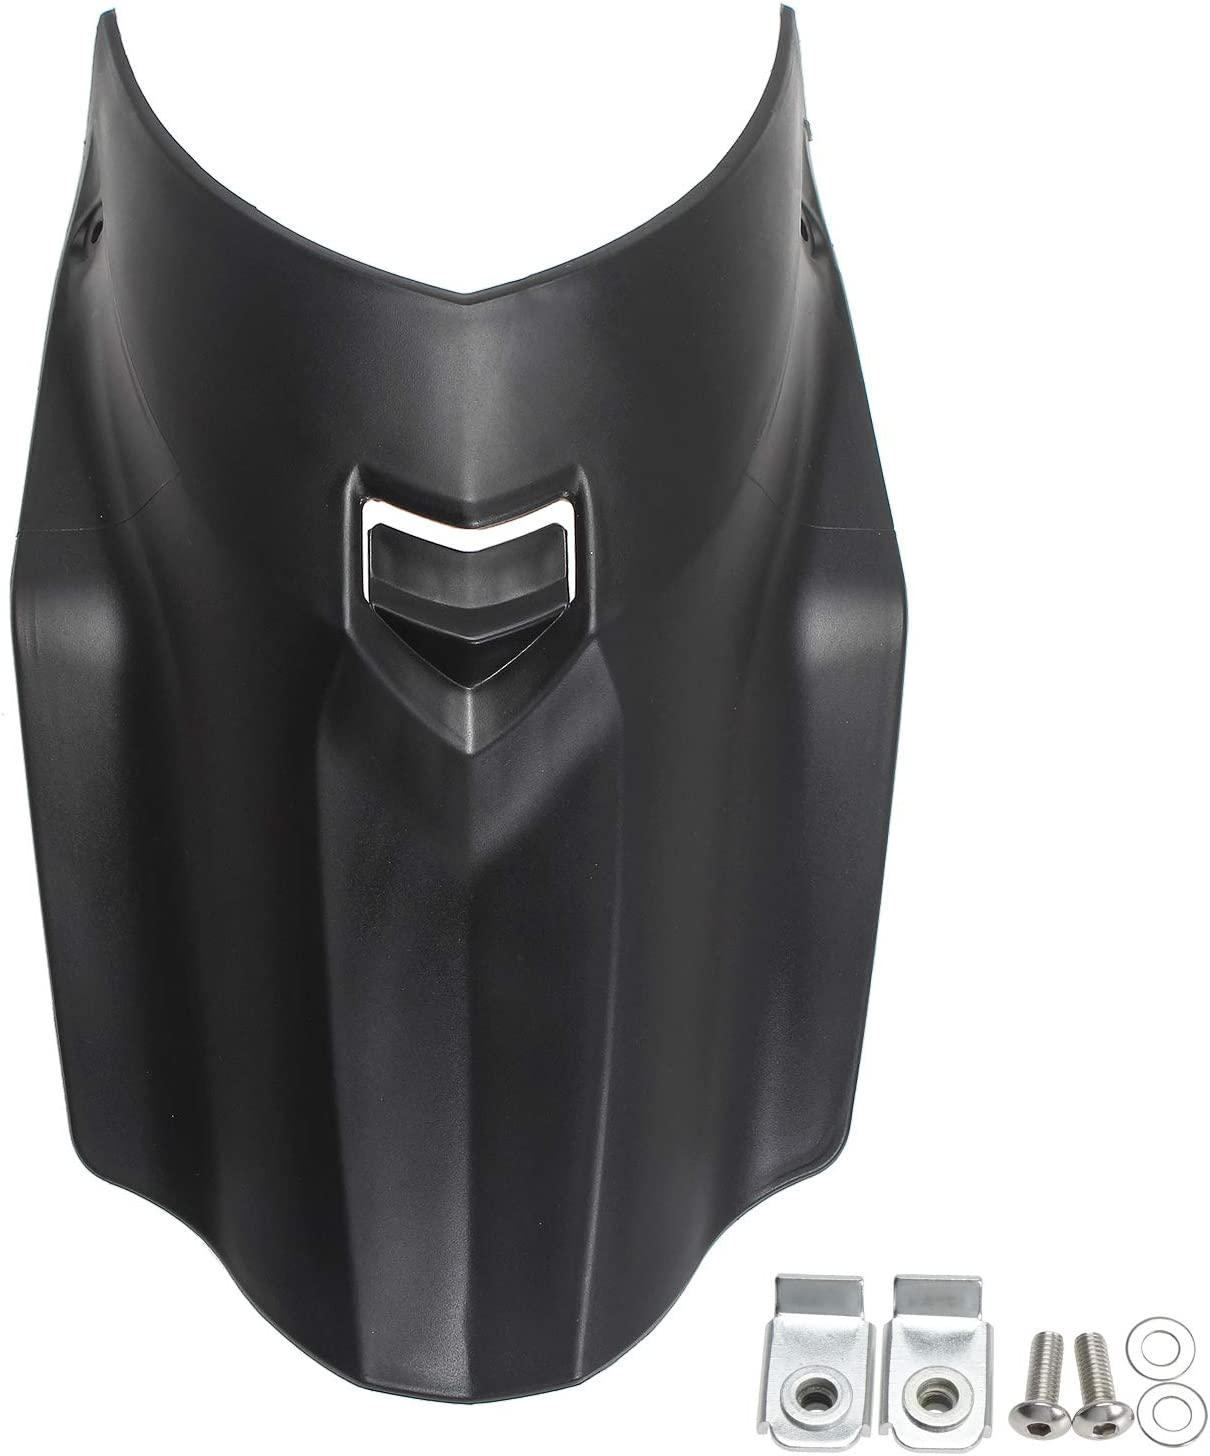 GIDIBII Motorbike Front Wheel Mudguard Fender Extender Extension For BMW R1200GS R1250GS ADV 2017-2019 Motorcycle Black